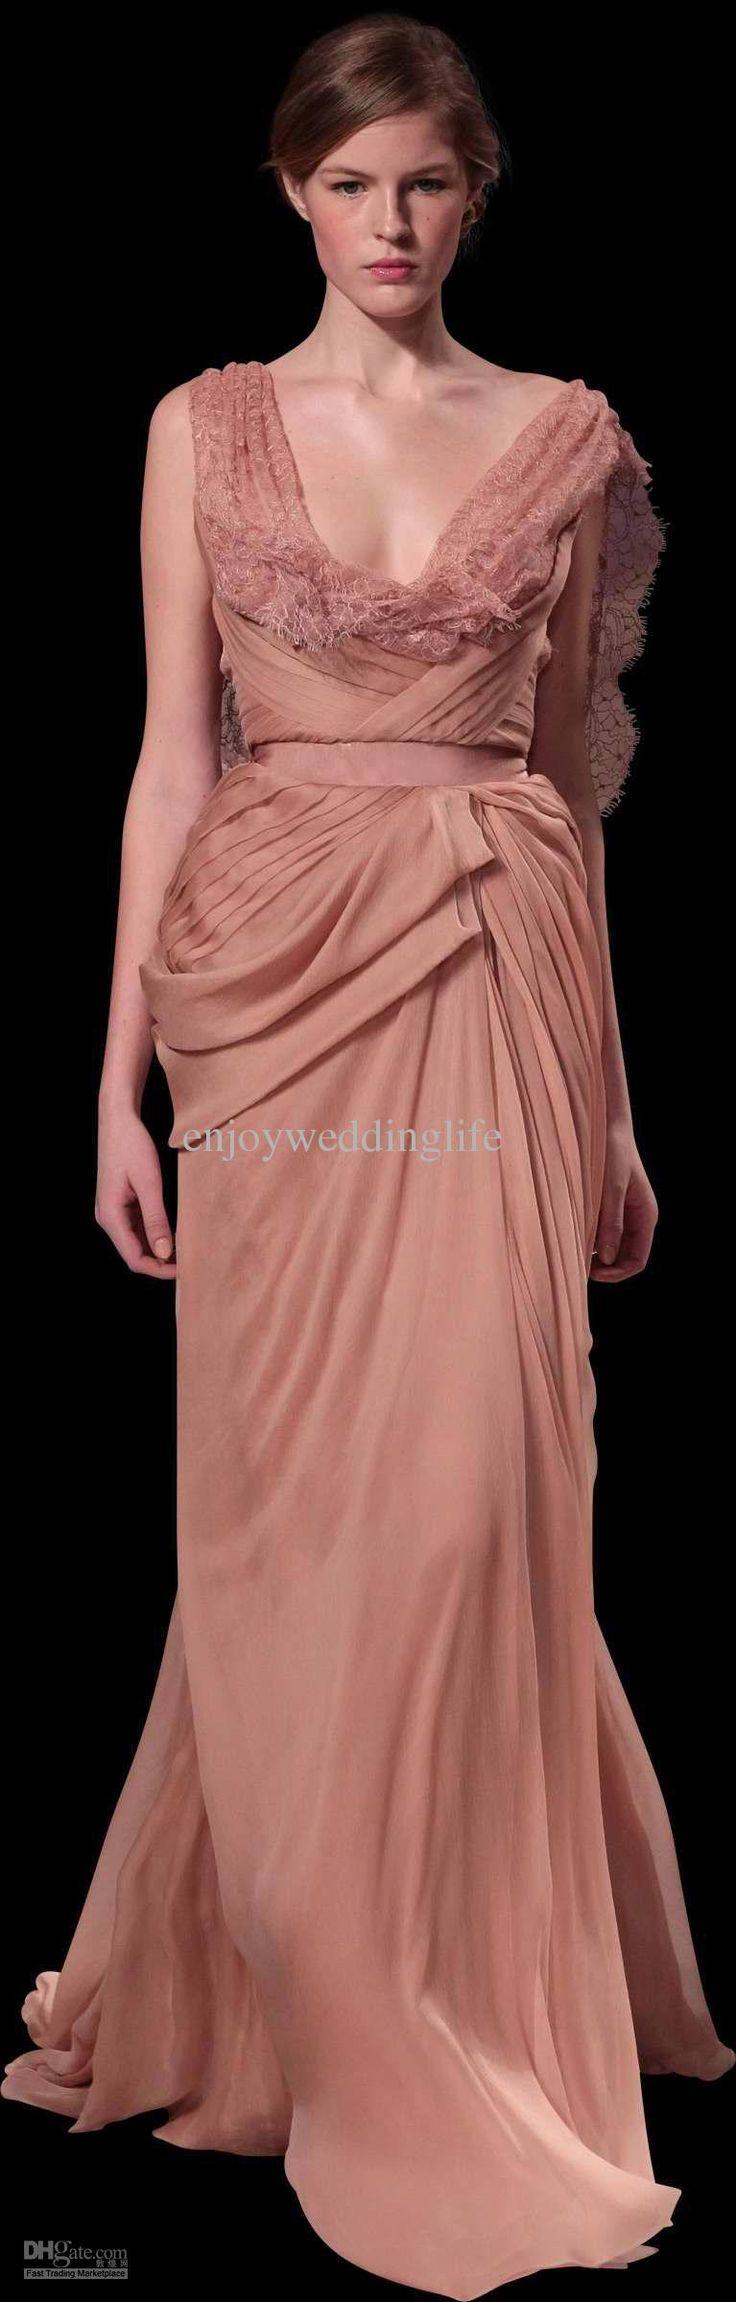 Magnífico Vestido De Novia De La Esposa De Gene Simmons Motivo ...